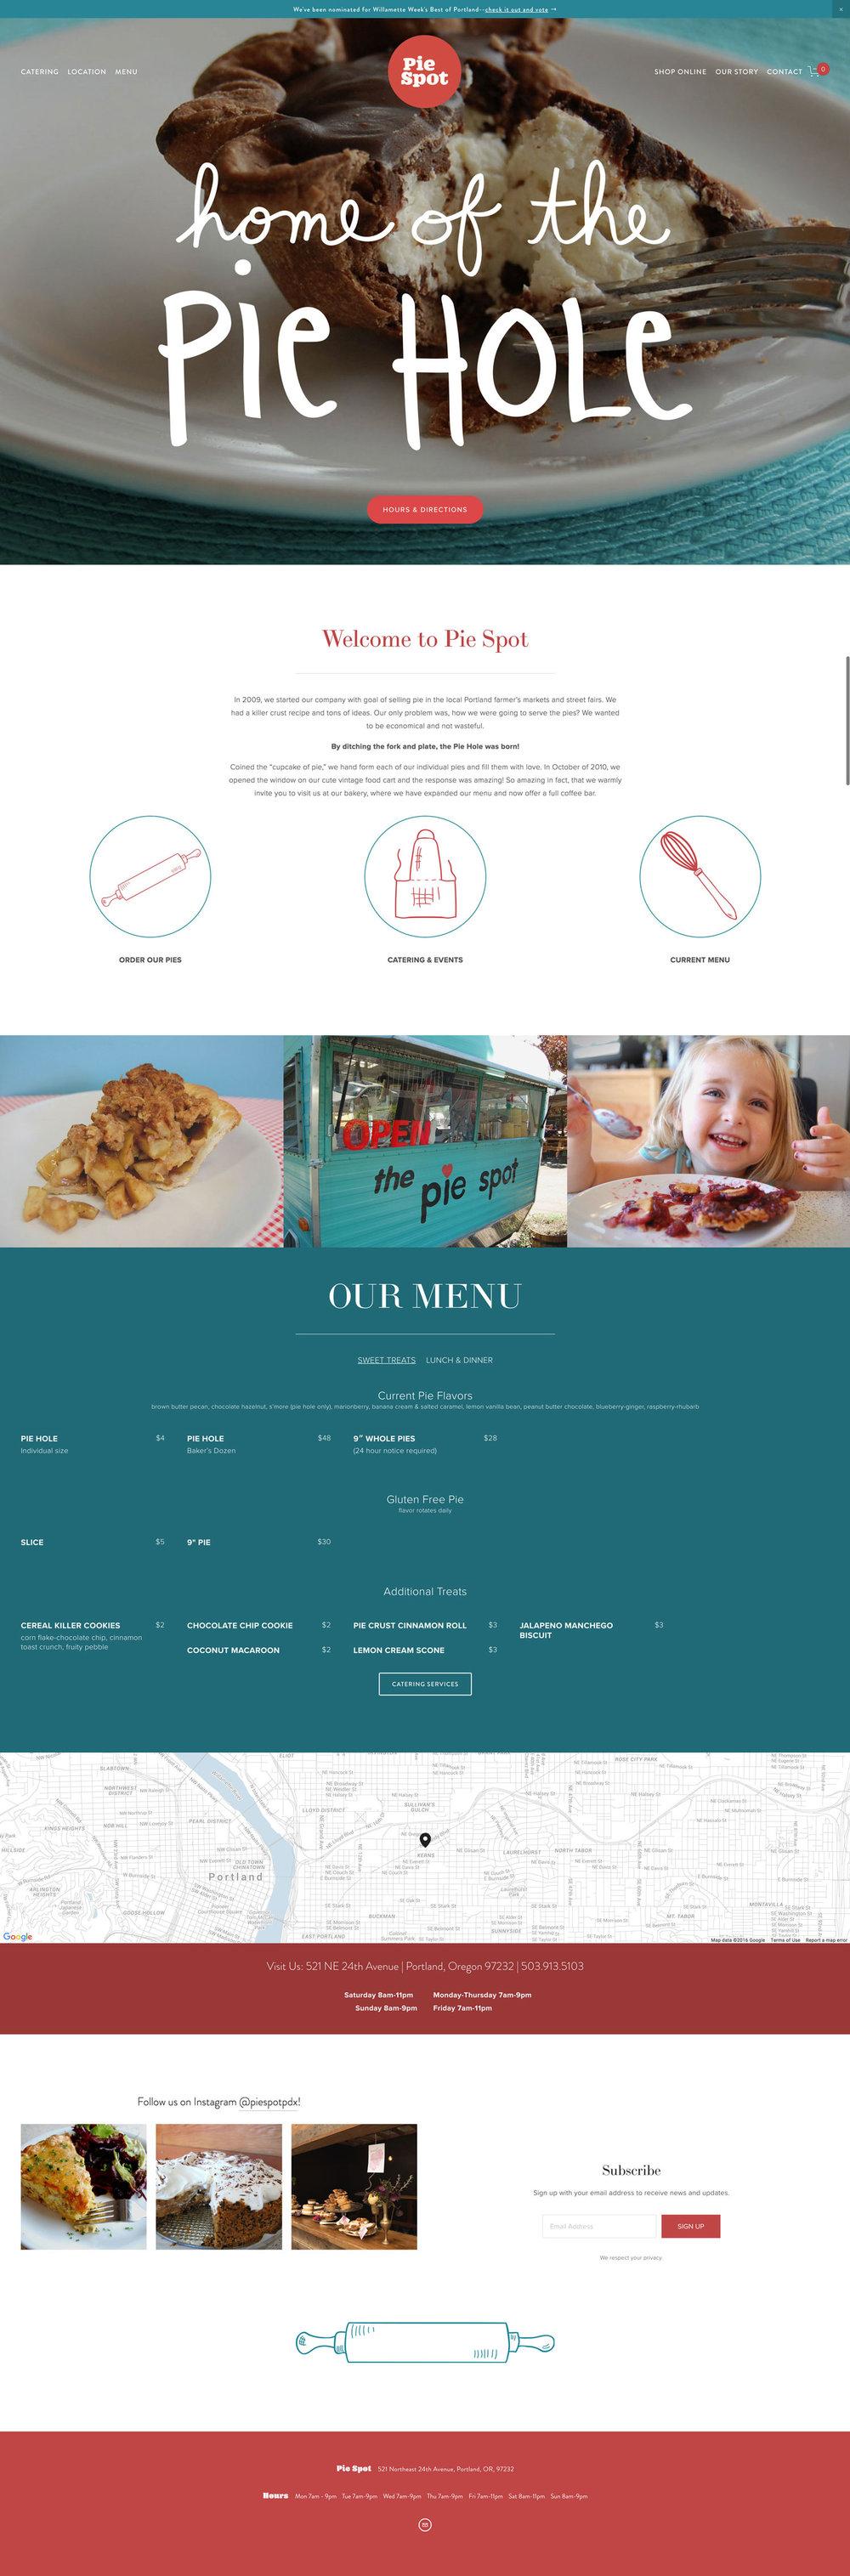 restaurant_homepage_Squaresapce.jpg